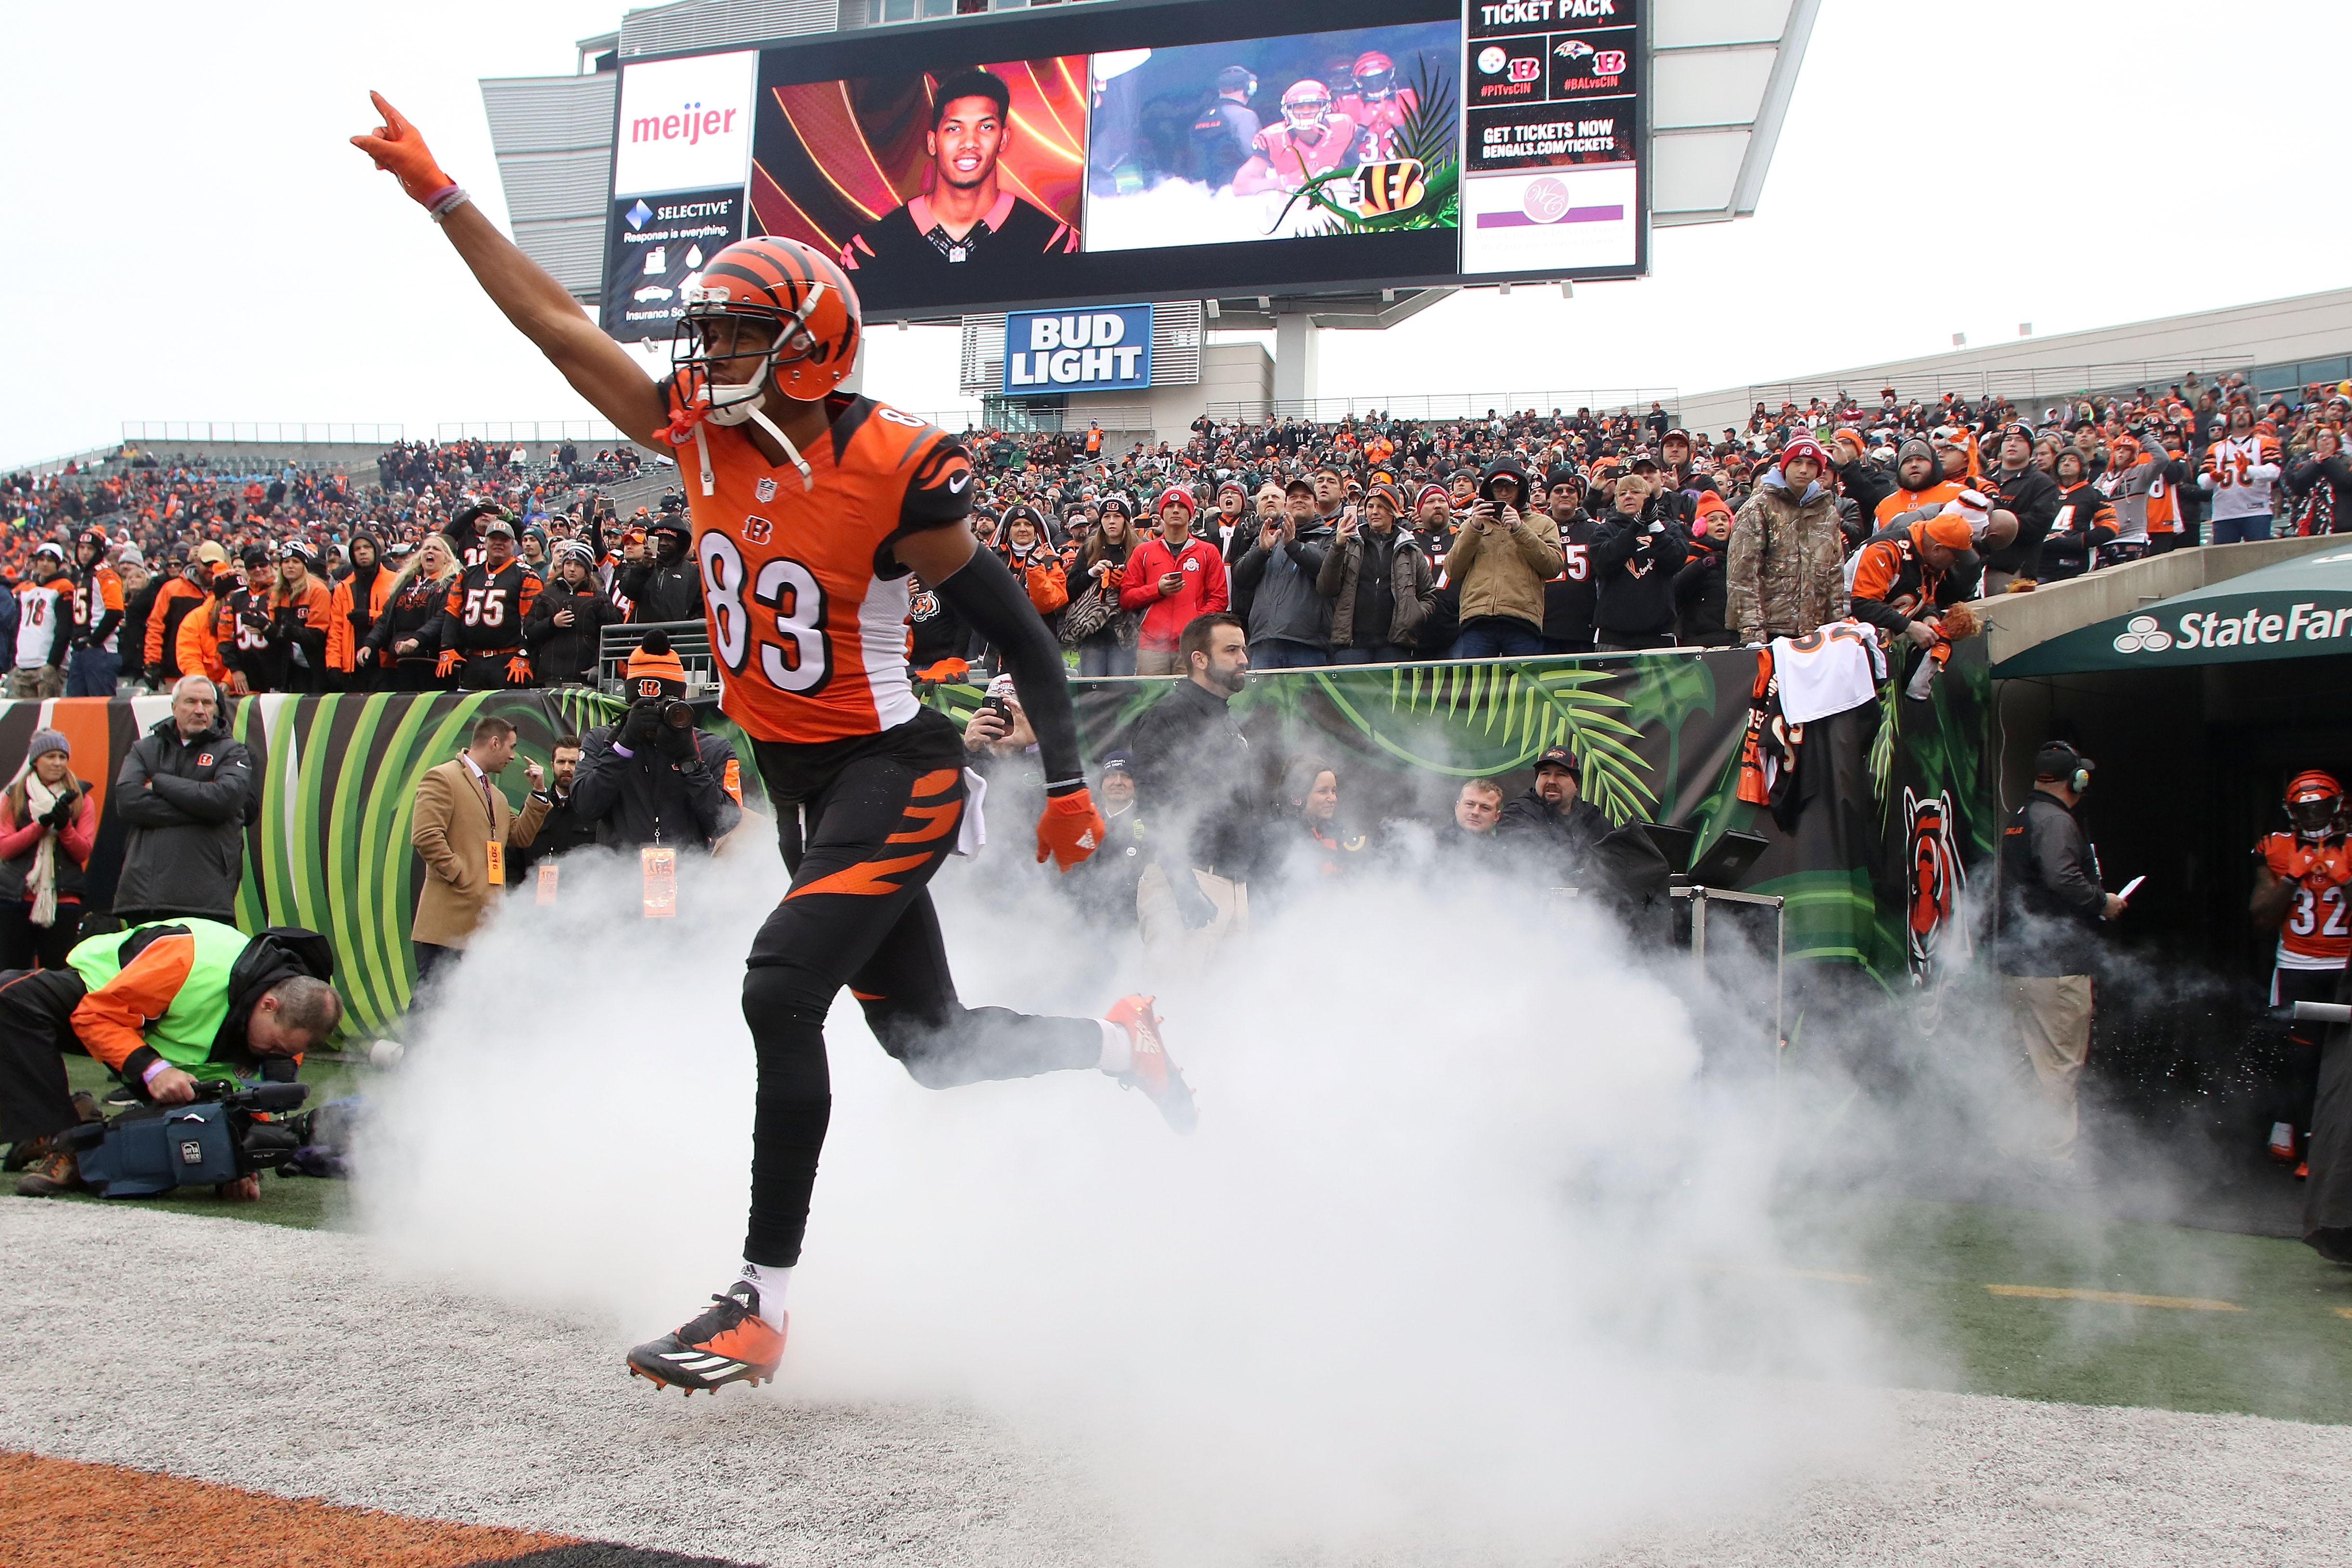 Cincinnati Bengals to wear orange jerseys vs. Buffalo Bills